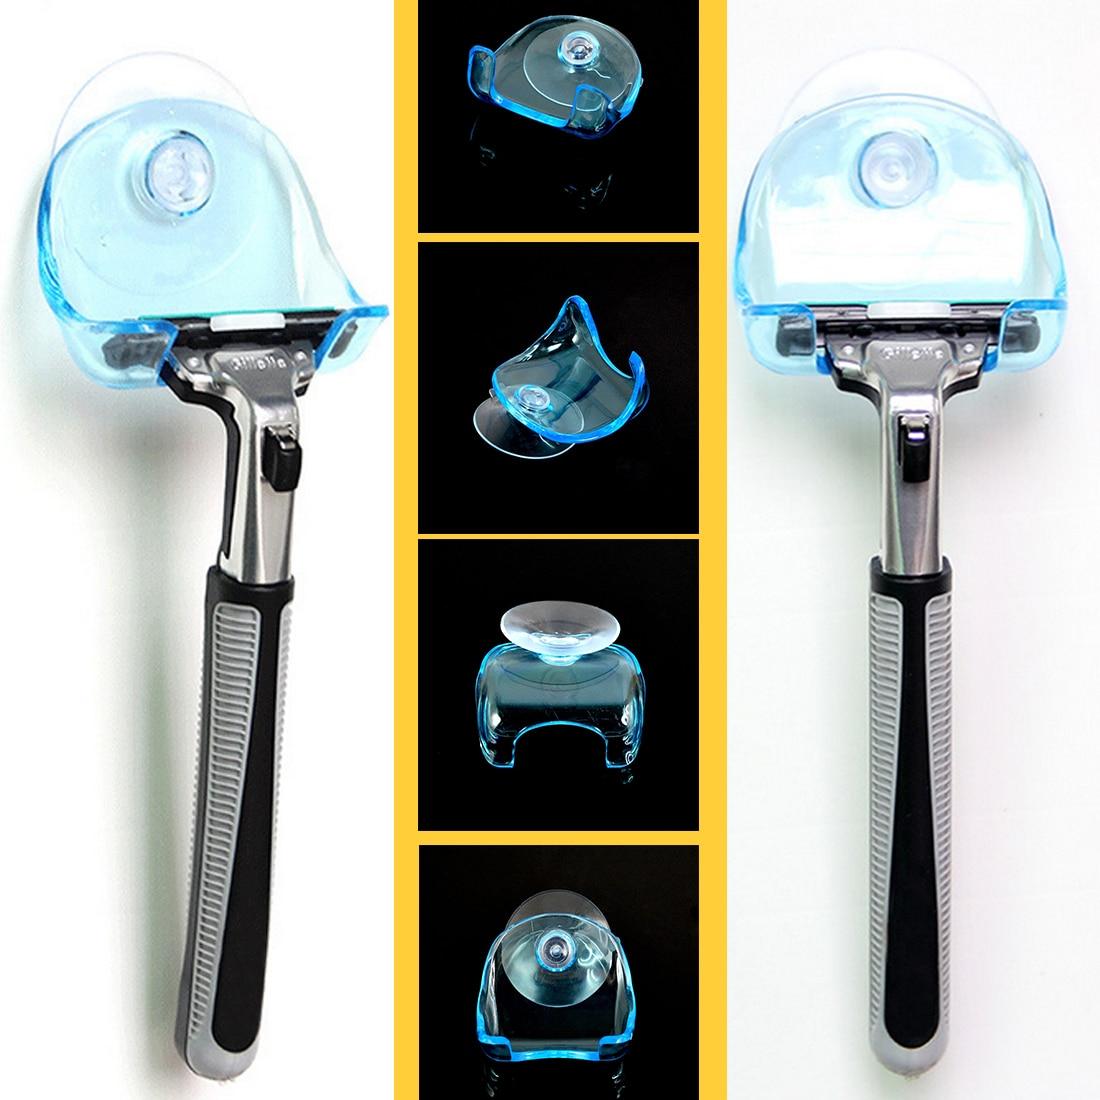 1 Pcs Clear Blue Plastic Super Saugnapf Gestochen Rack Bad Razor Halter Saugnapf Rasierer